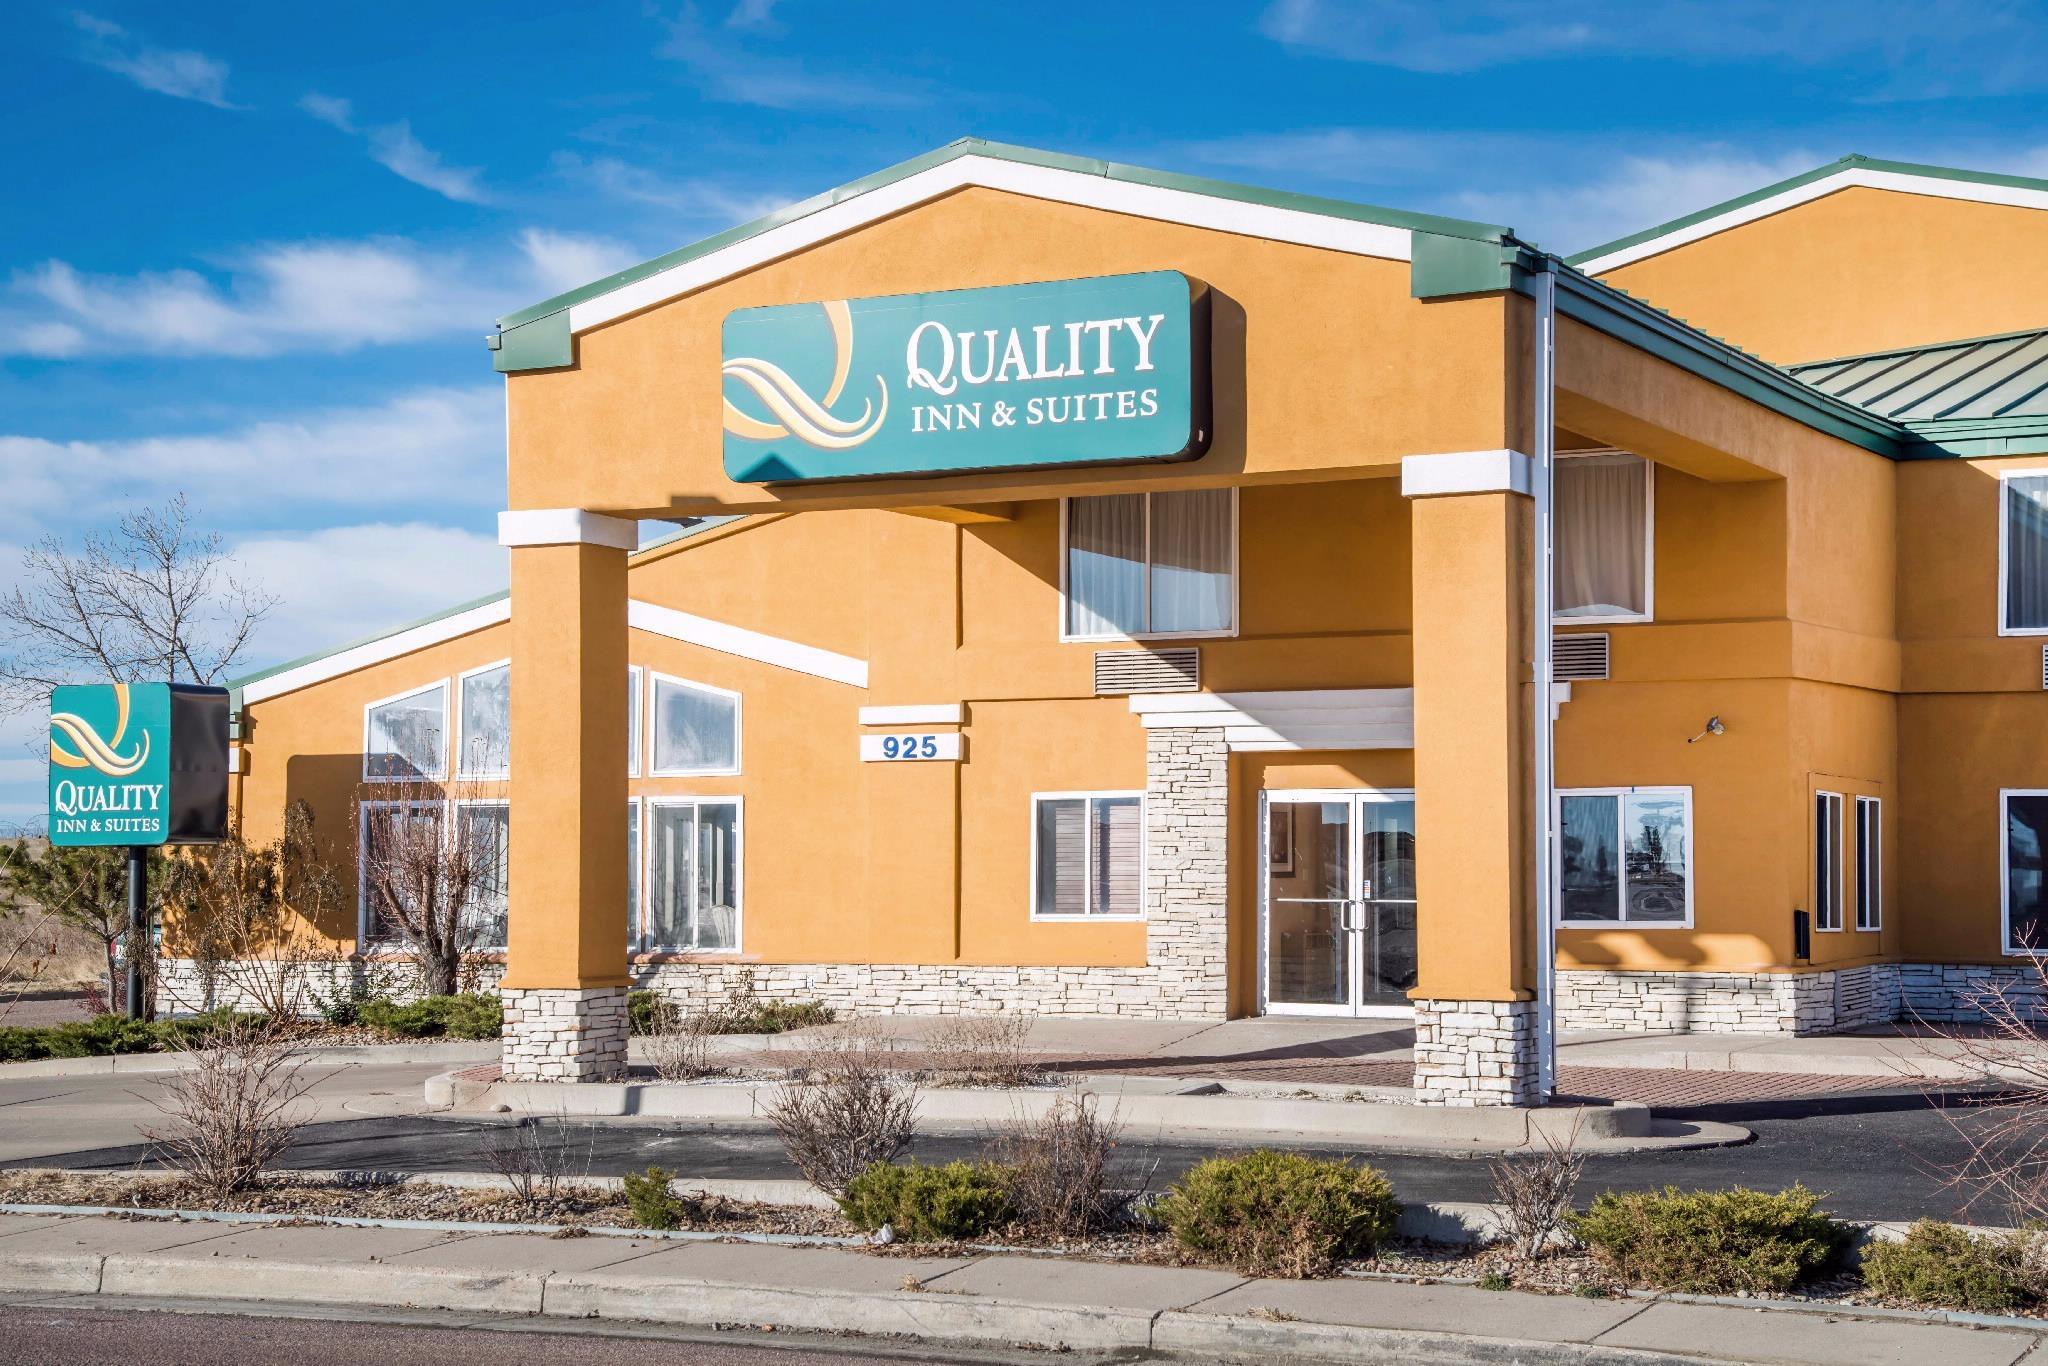 Limon Co Hotels Motels